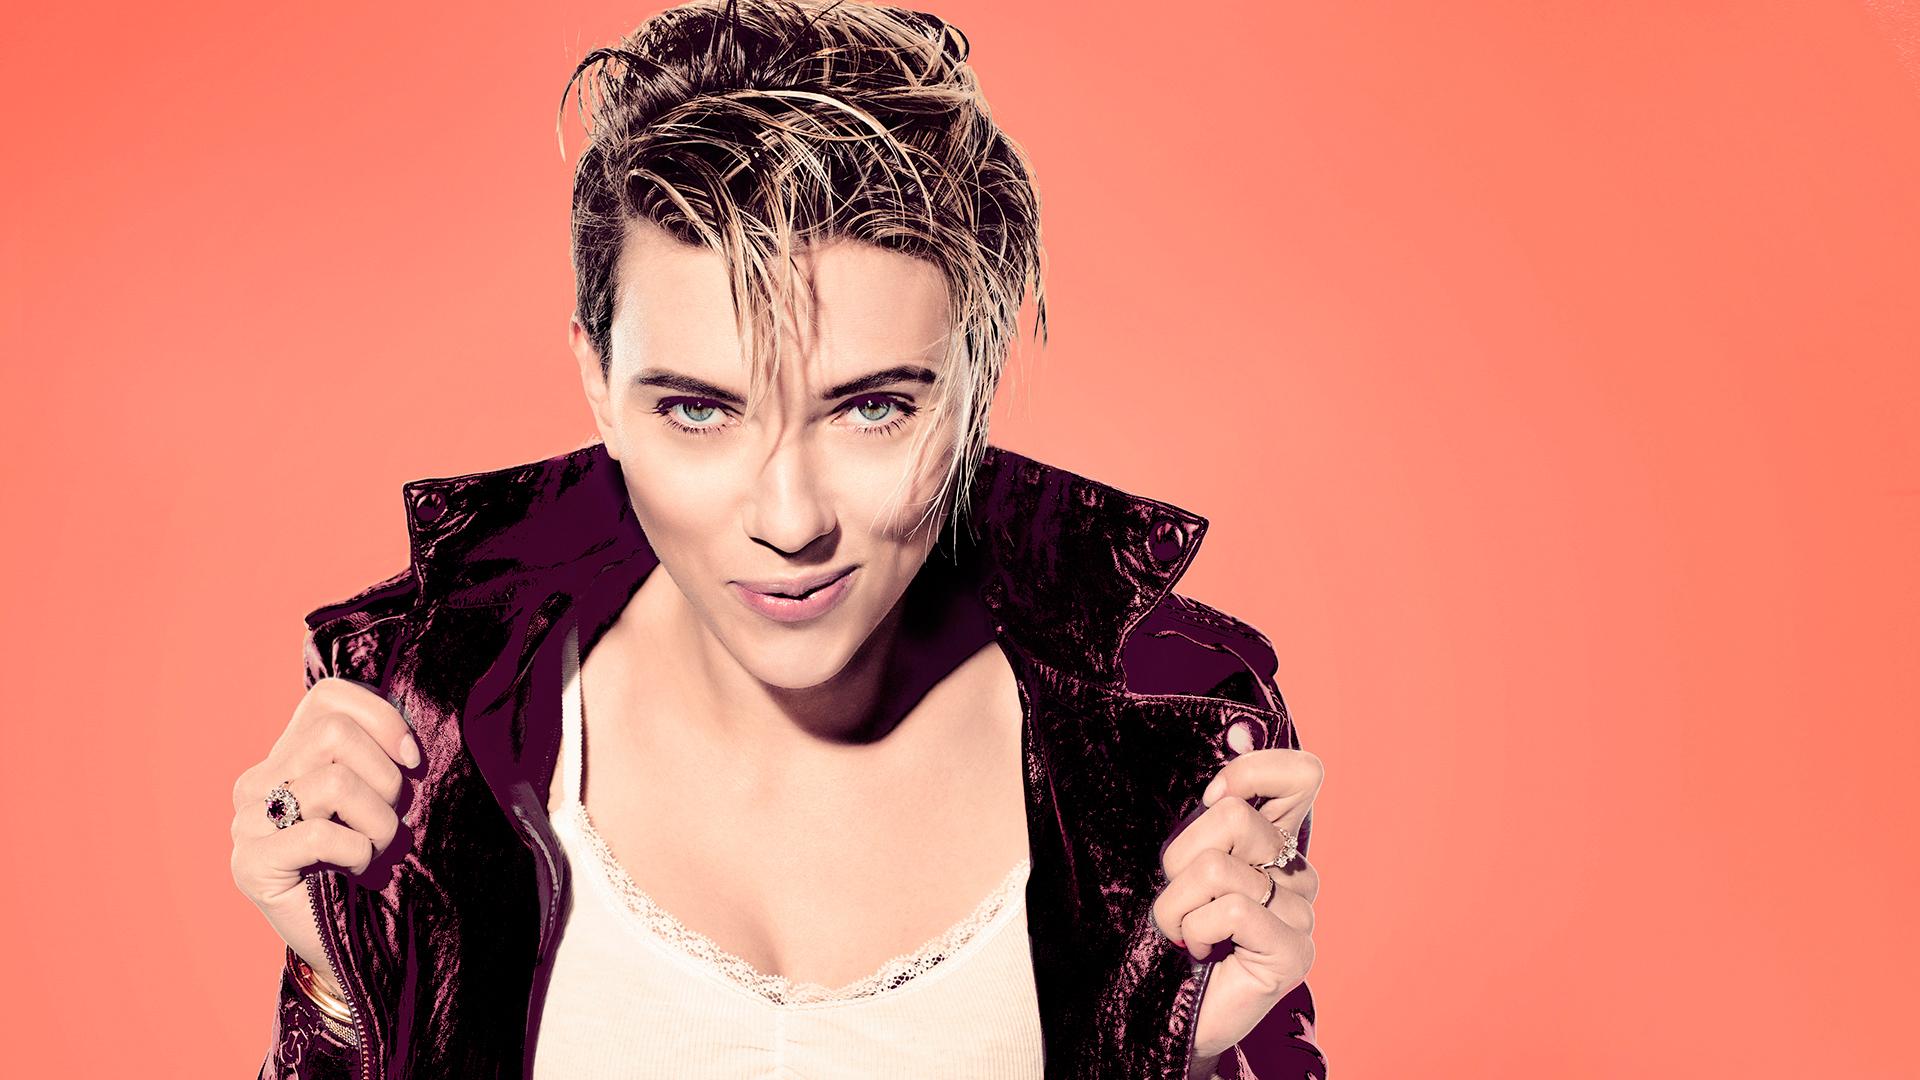 Scarlett Johansson Photo Shoot Saturday Night Live Wallpaper 1920x1080